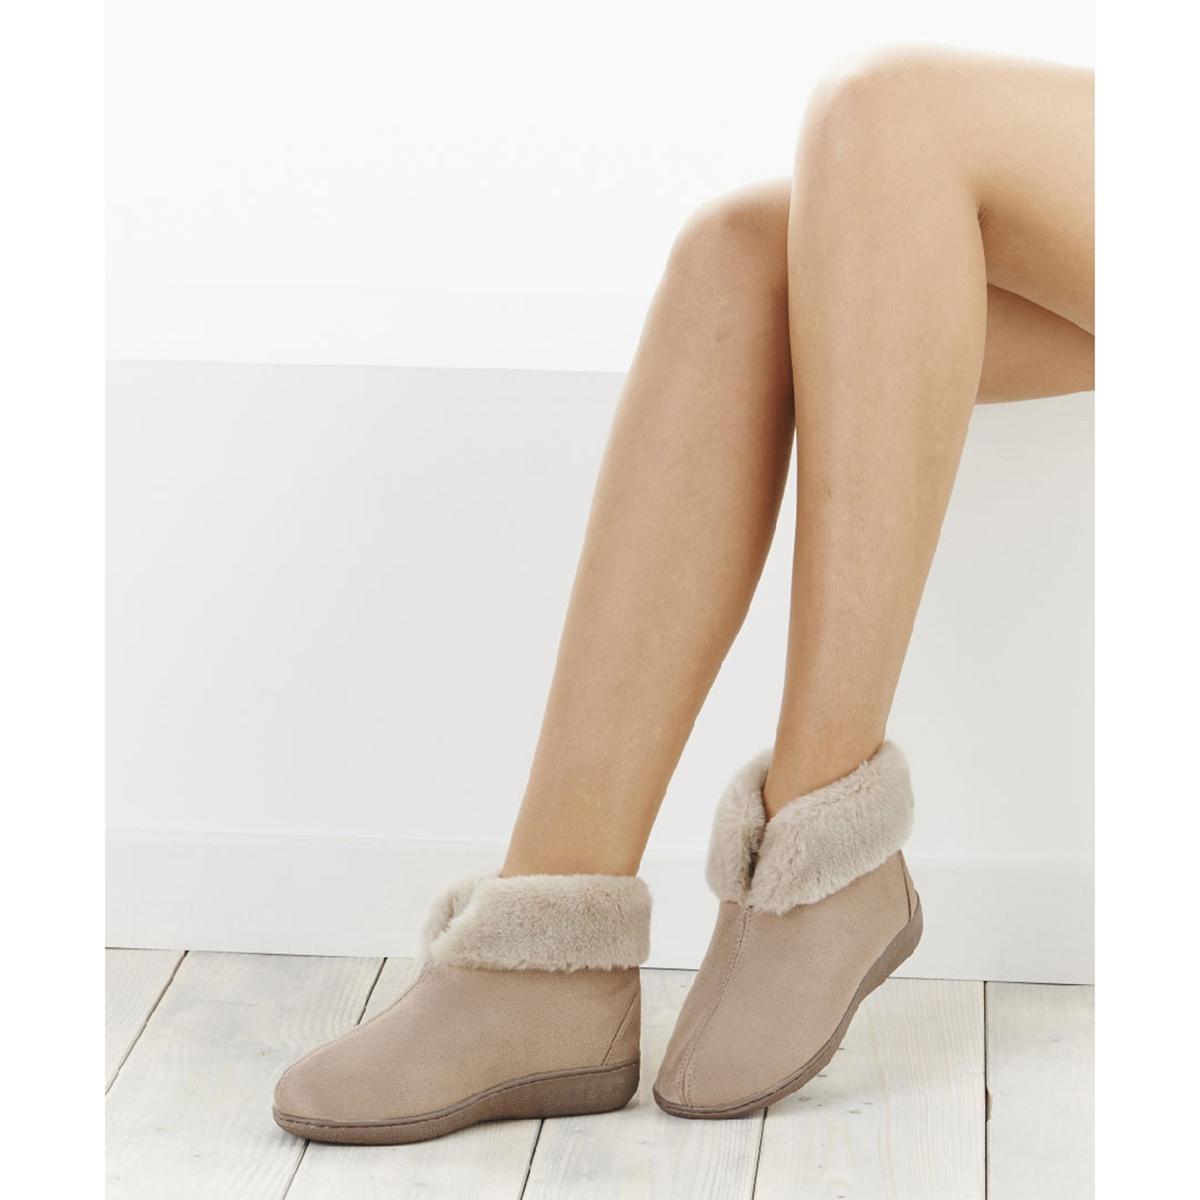 Туфли-ботинки на меху Thermolactyl® тапки на меху войлочные thermolactyl®